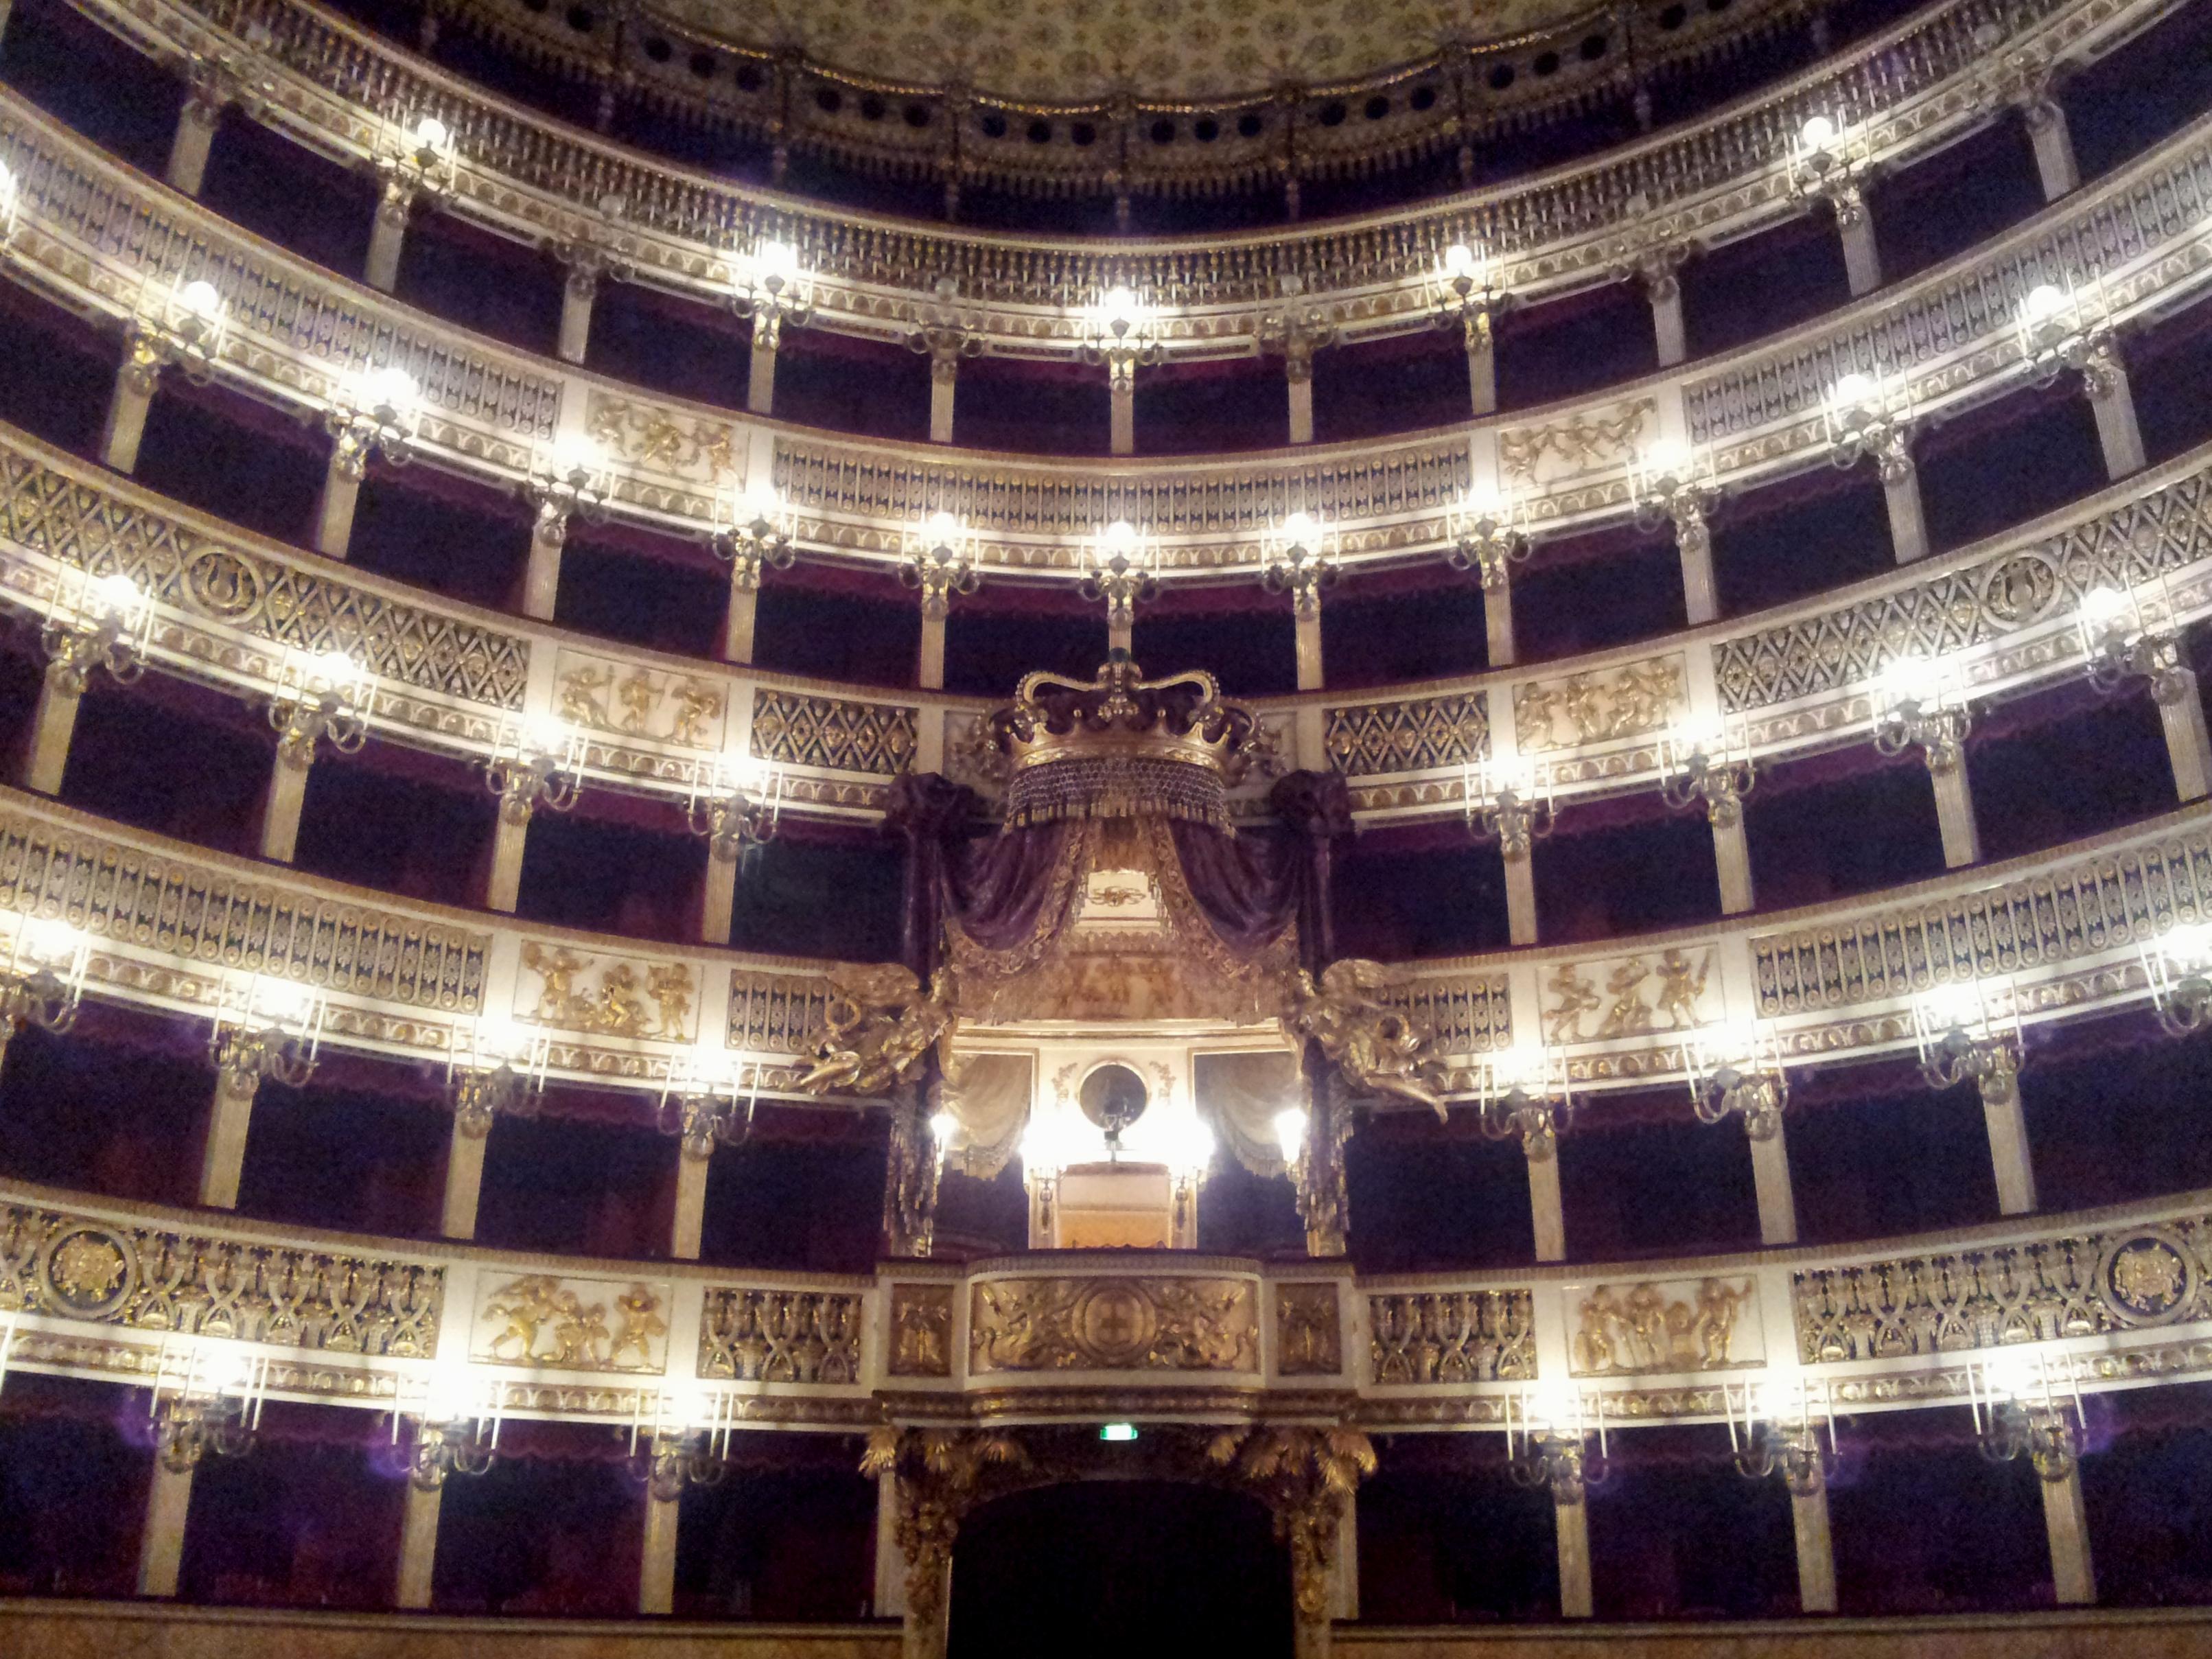 low cost 2a2d6 1ade0 Teatro all'italiana - Wikipedia